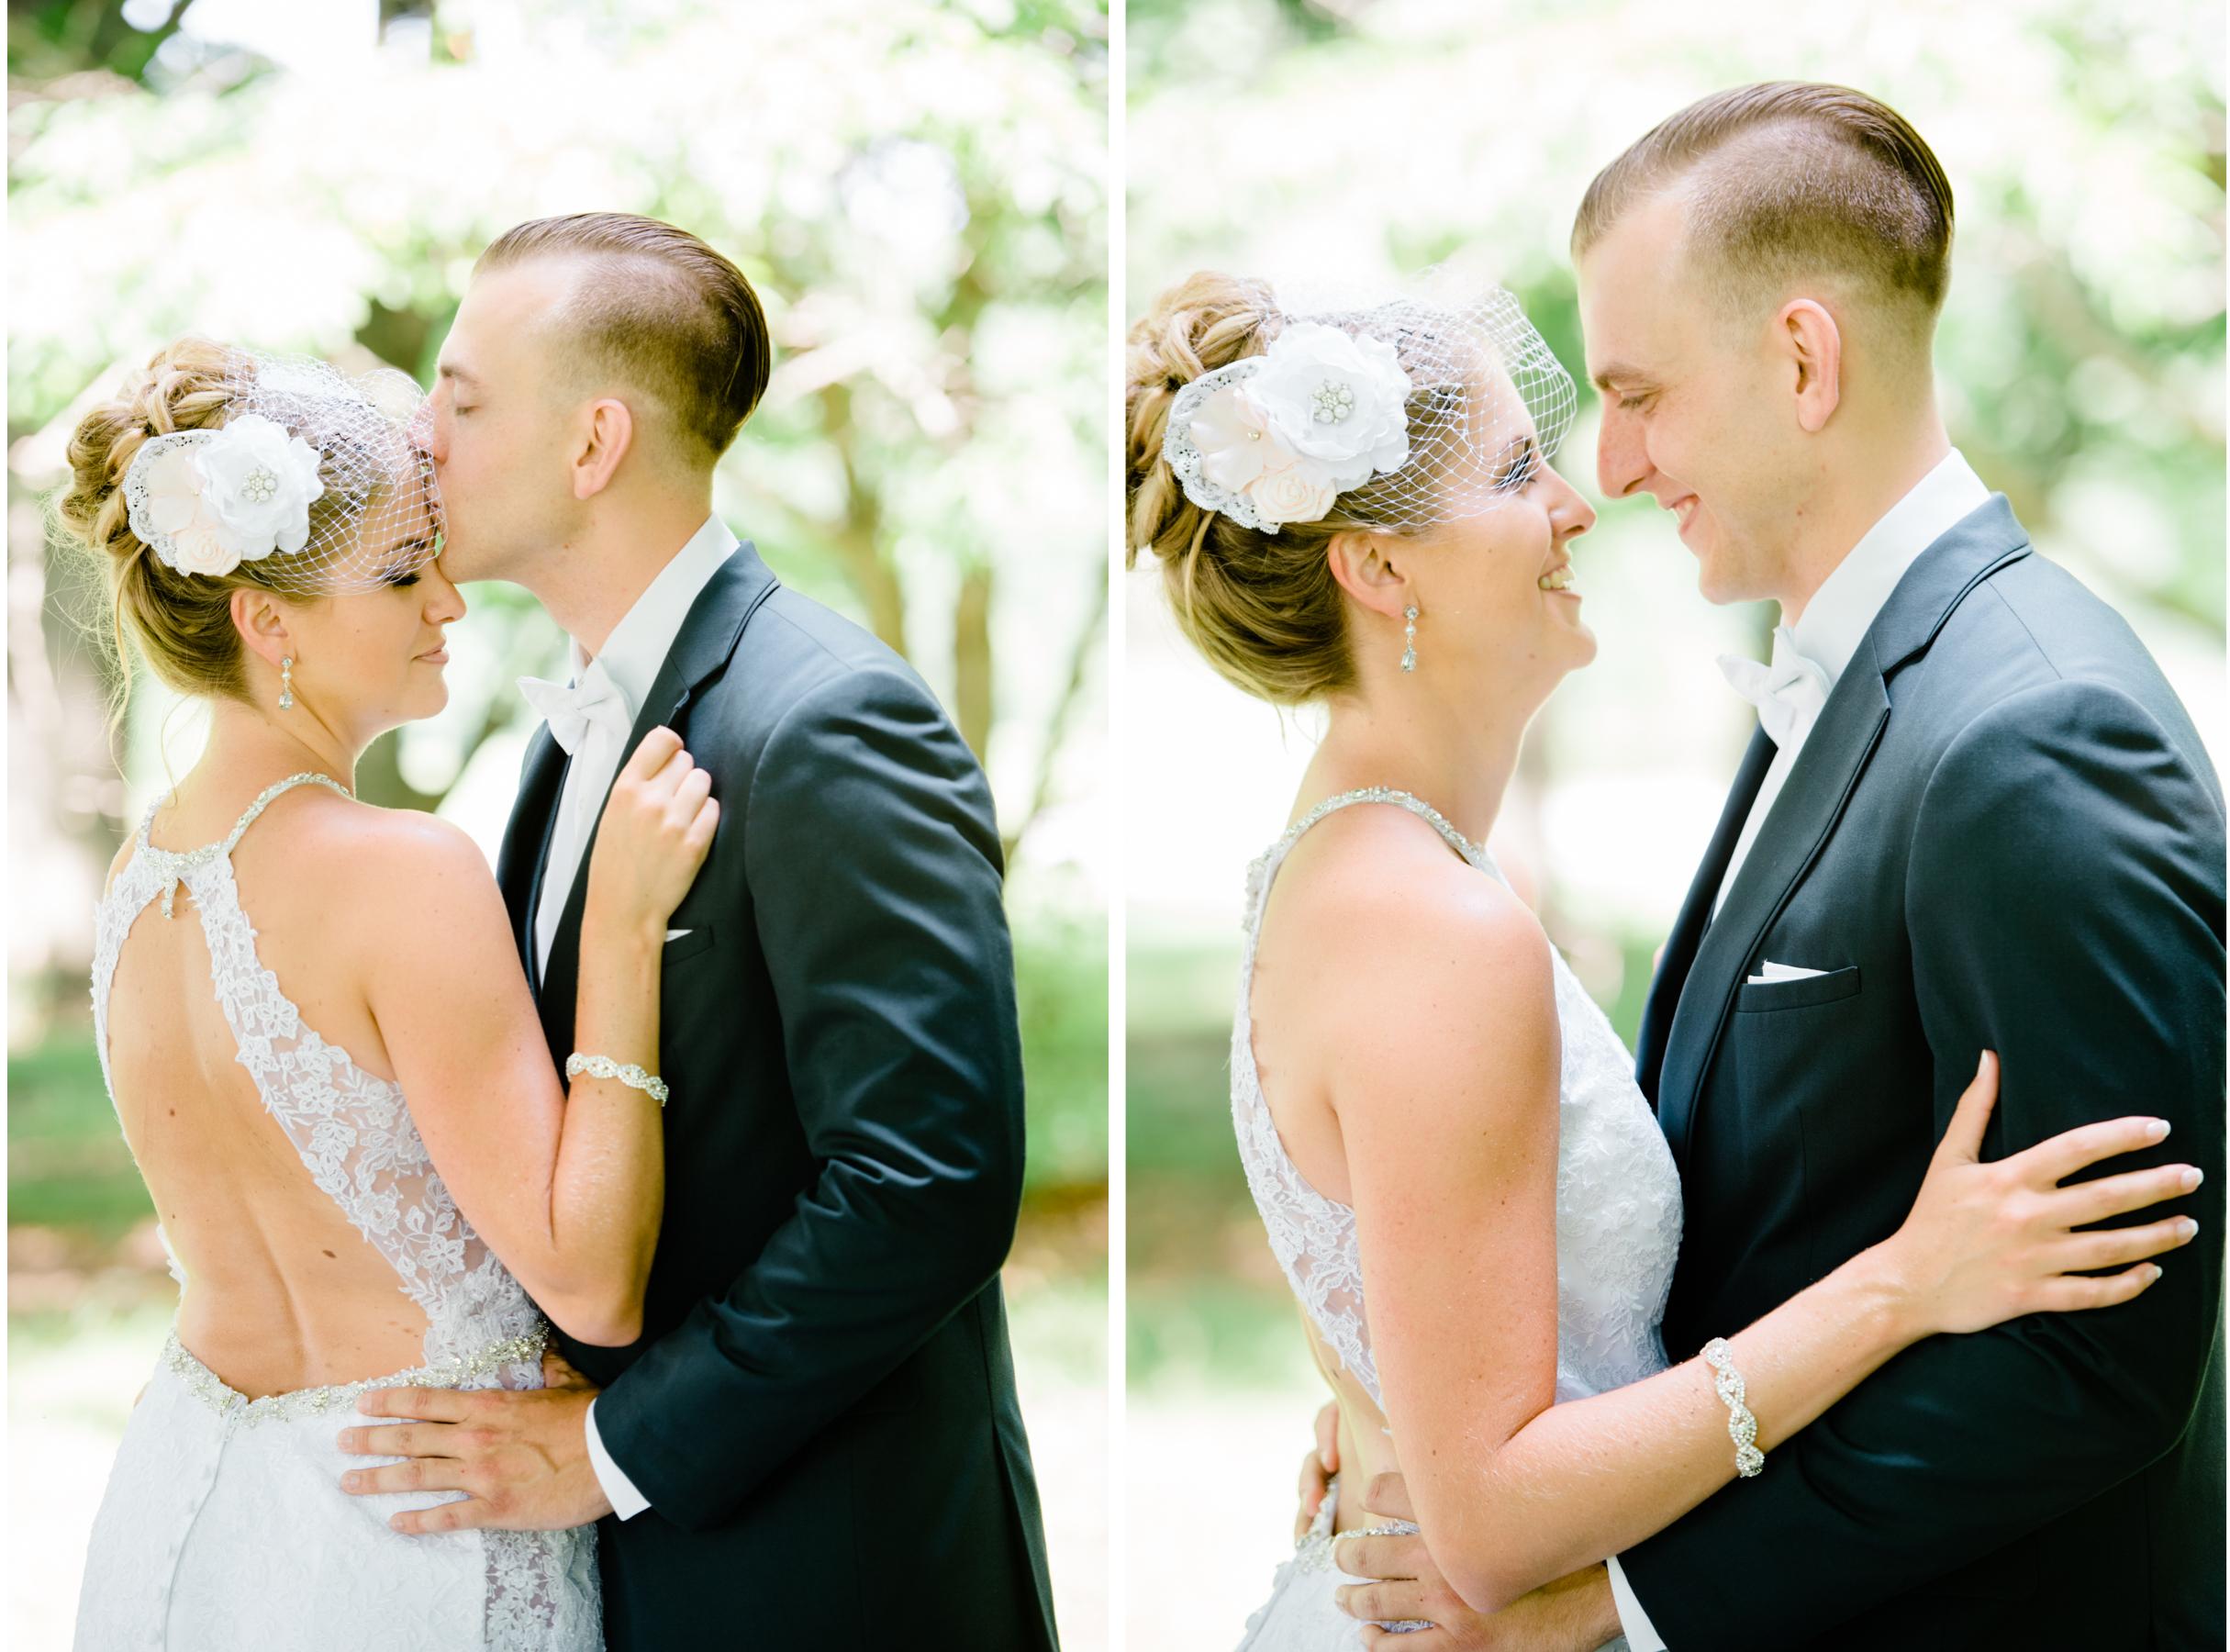 Bride and Groom Wedding Portraits Wedding Photography, Mariah Fisher.jpg